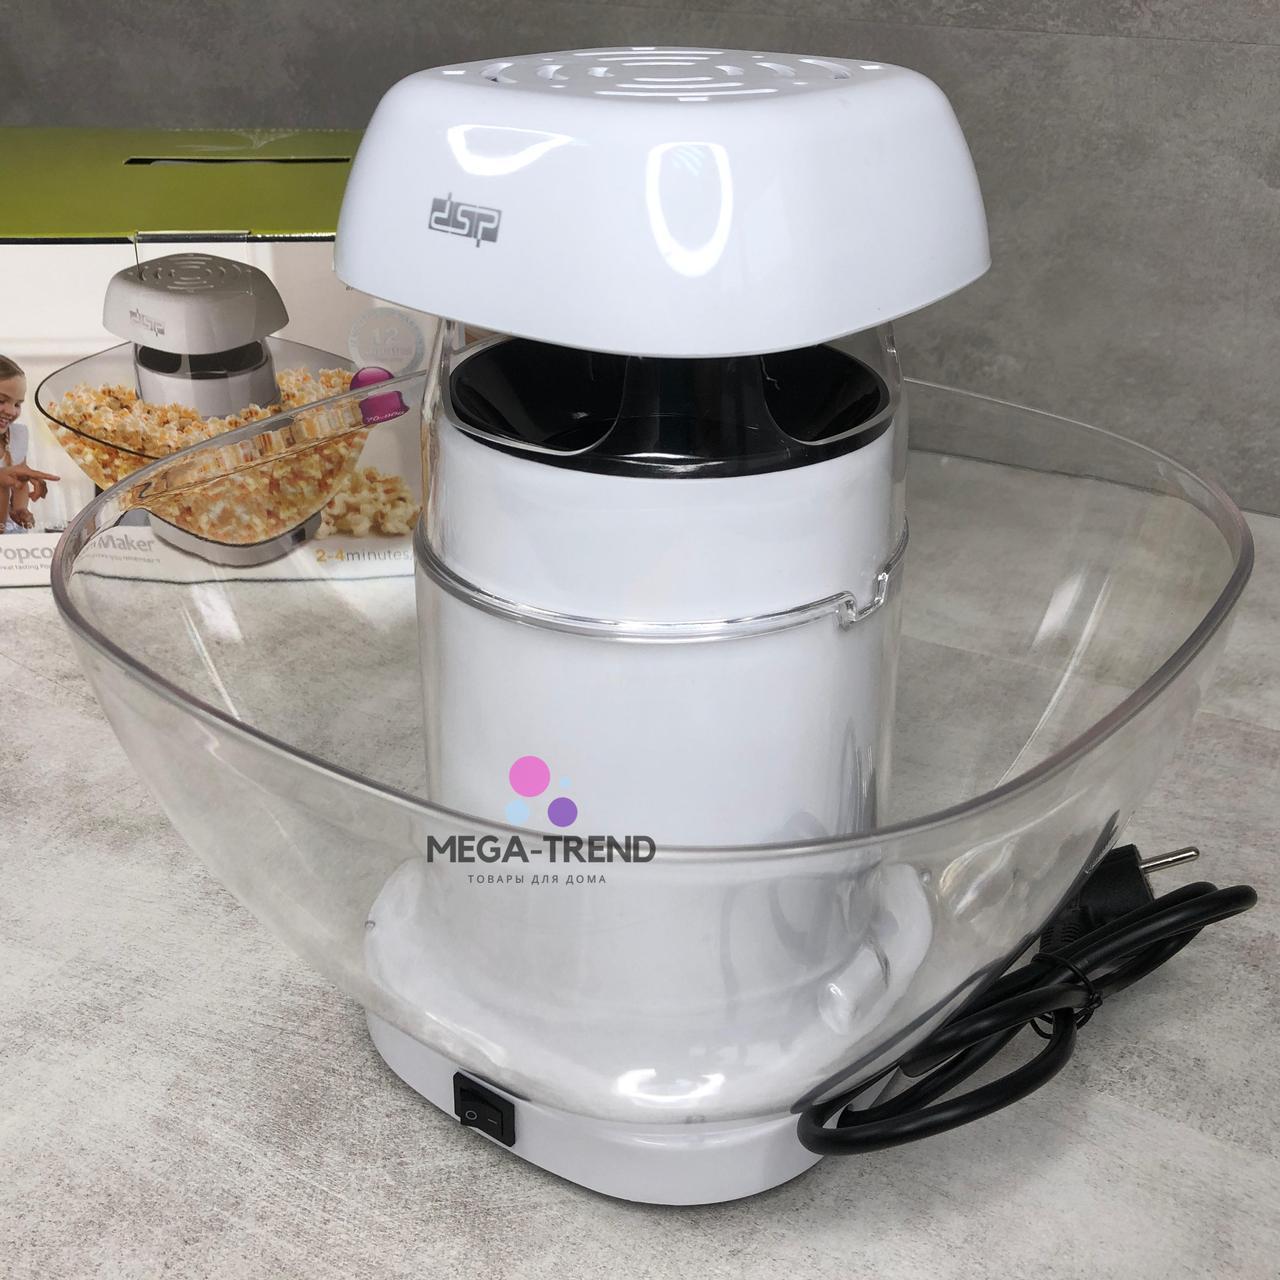 Попкорница, Аппарат для приготовления попкорна Popcorn maker DSP KA2018